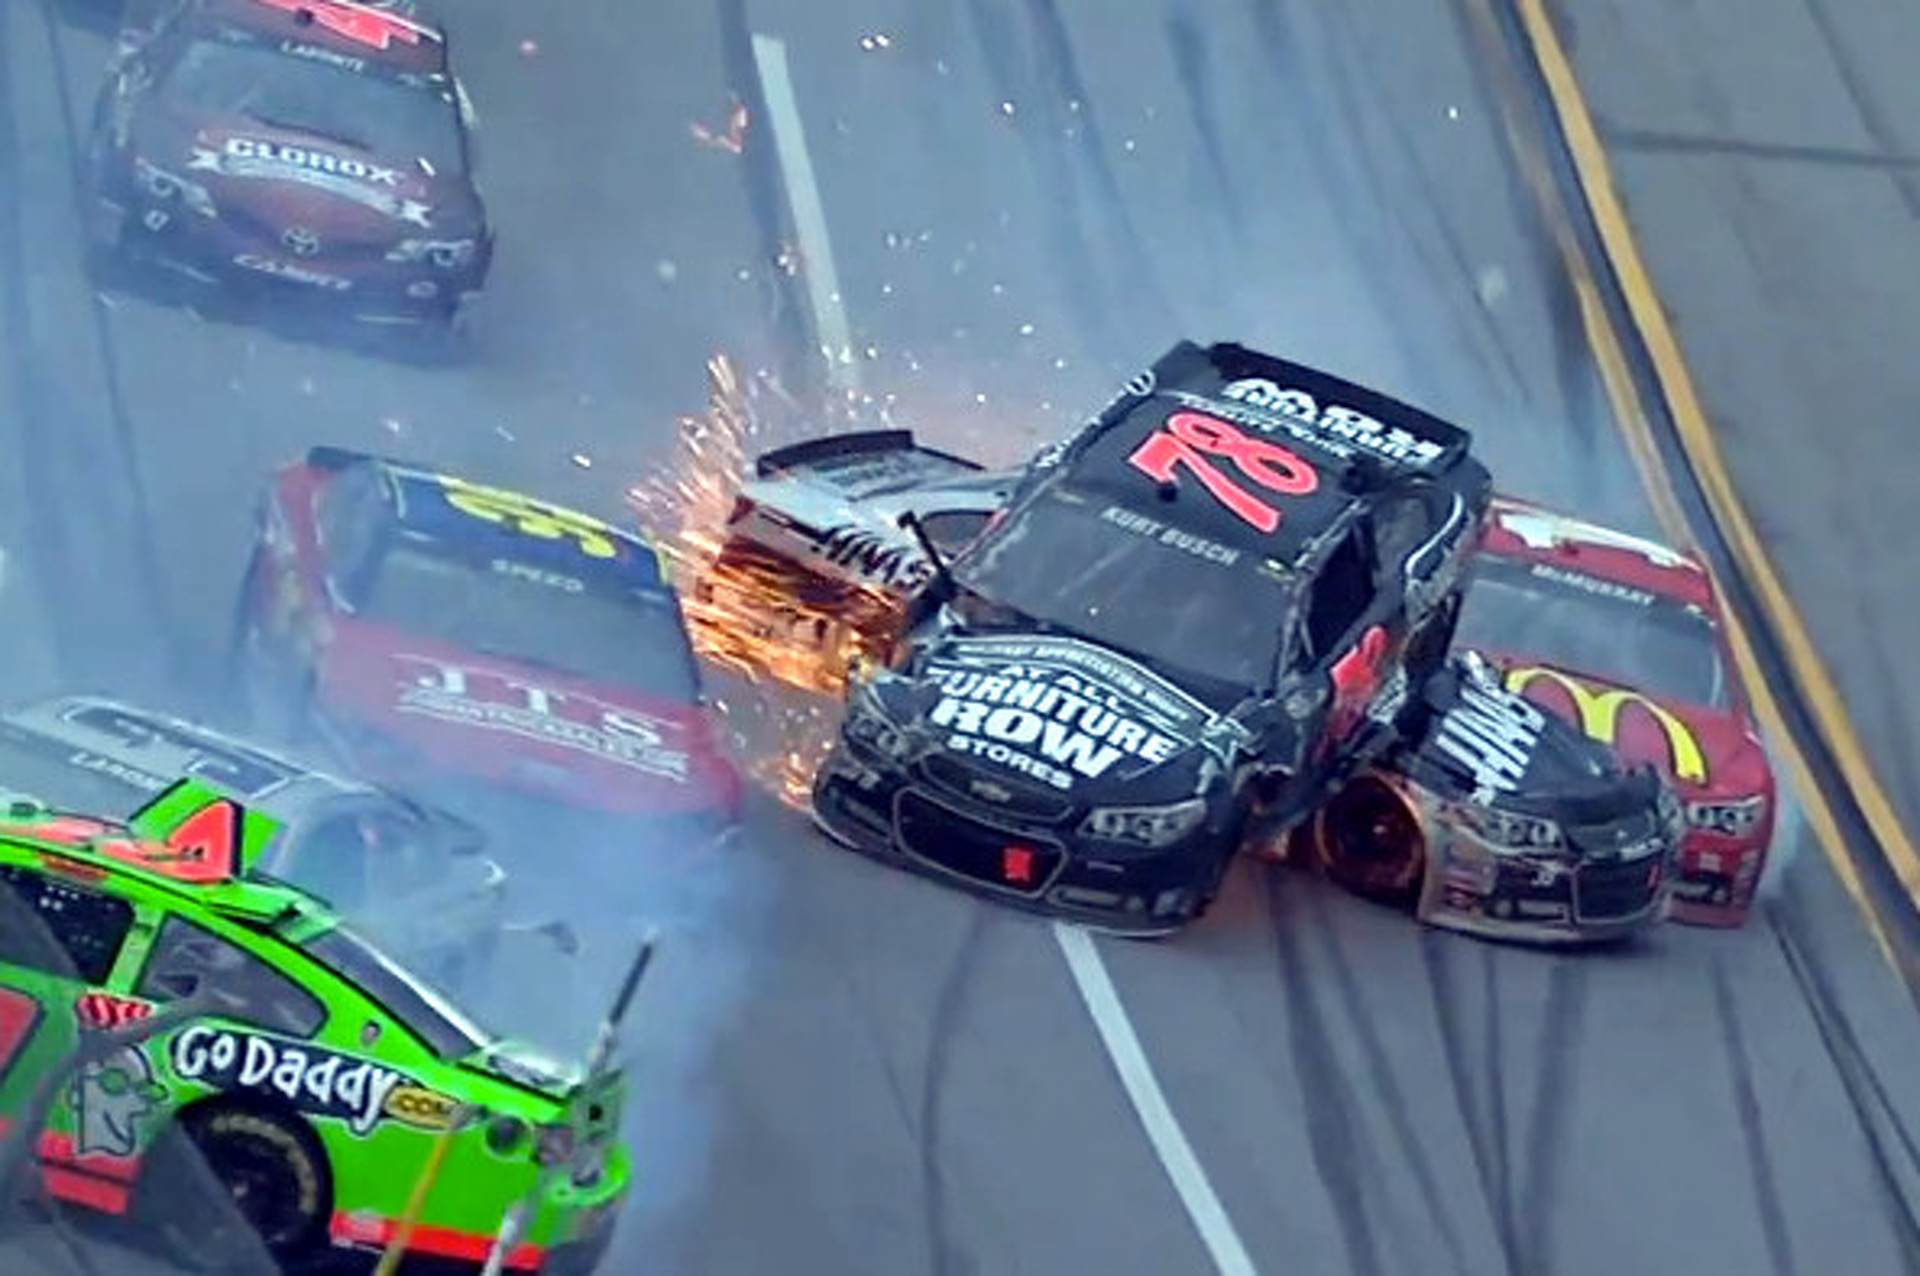 Video: 'The Big One' Strikes Again at Talladega